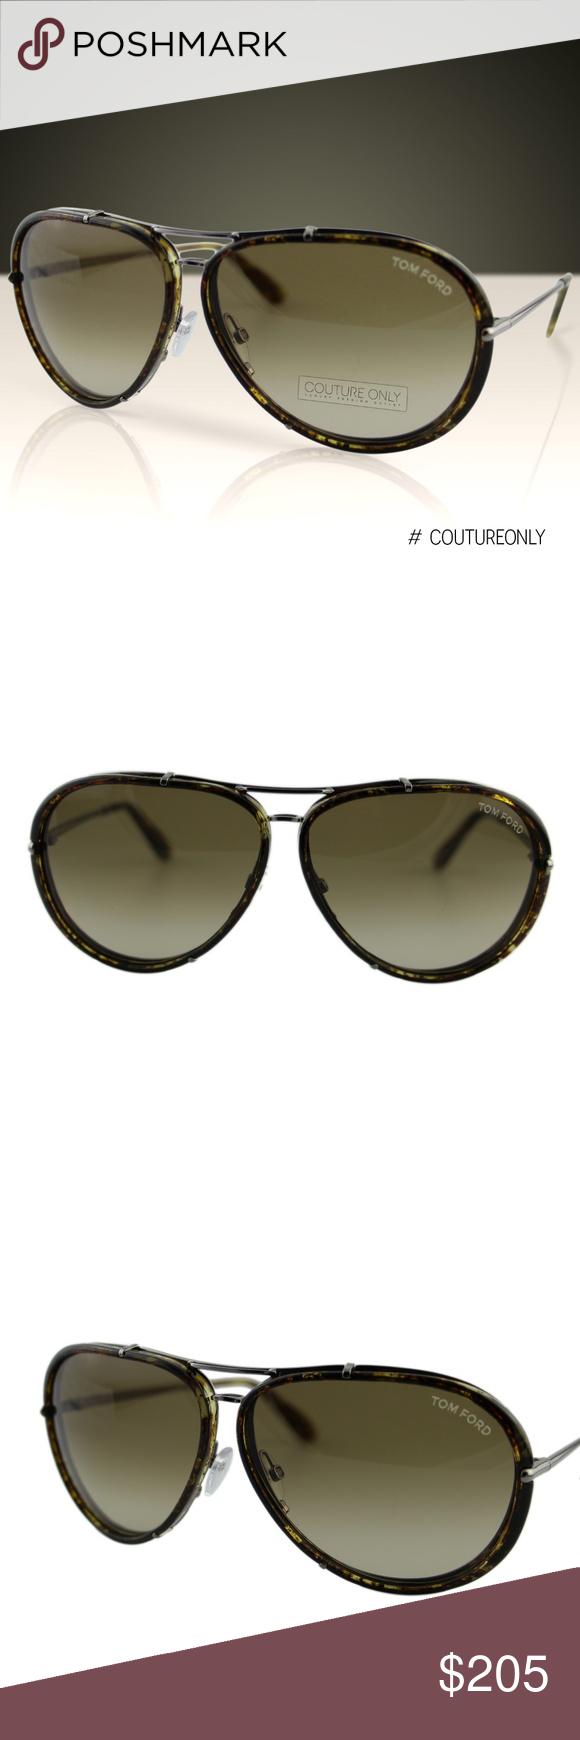 Tom Ford Cyrille FT-109 14P Olive Brown Havana Gunmetal Pilot Sunglasses 63mm